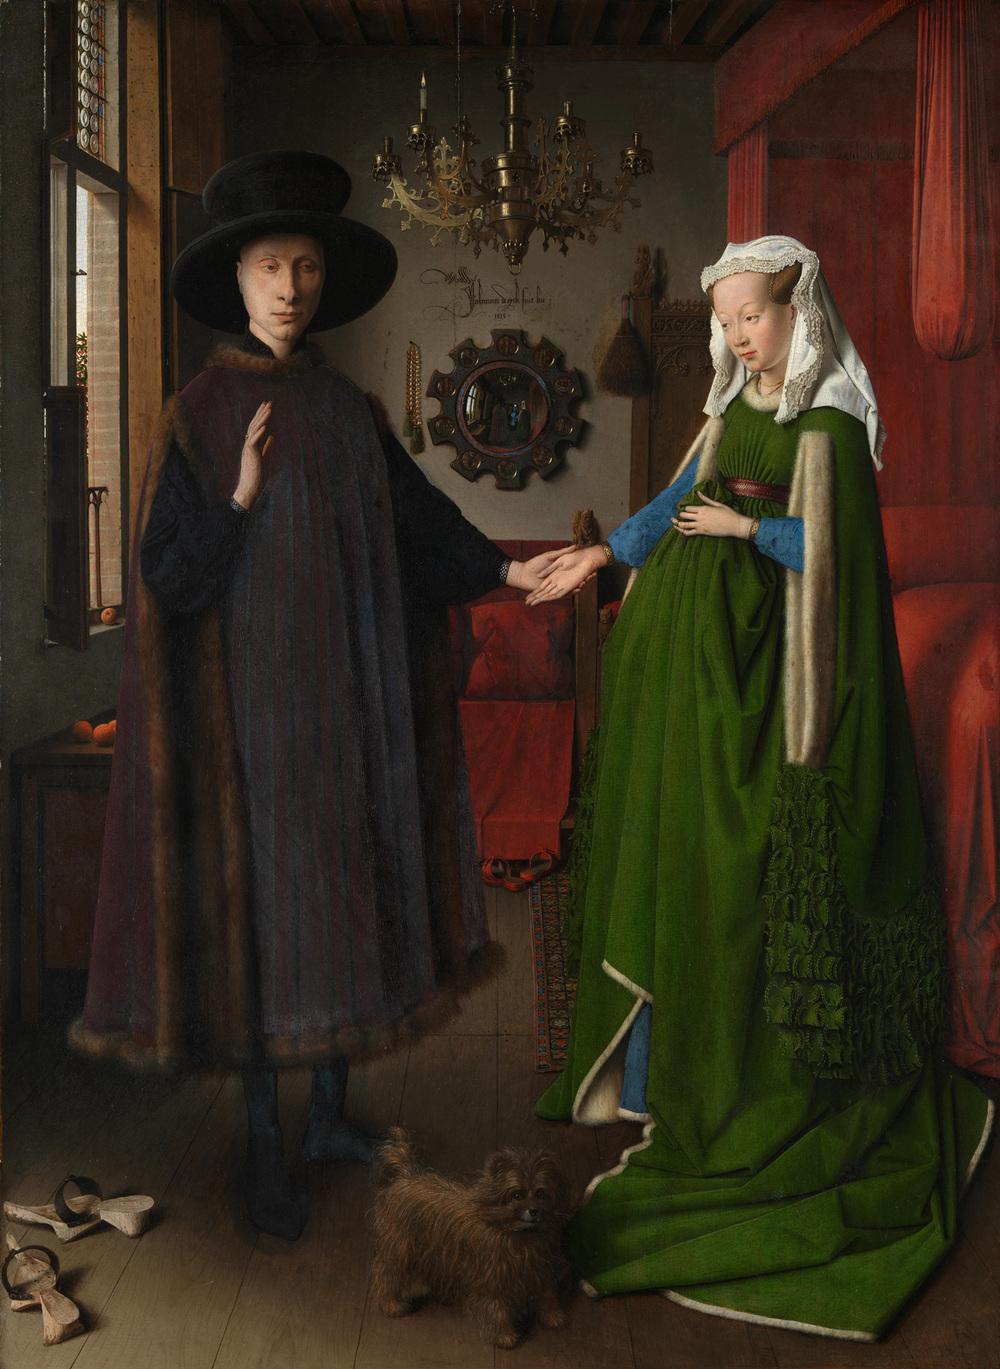 Van_Eyck_-_Arnolfini_PortraitCC2.jpg